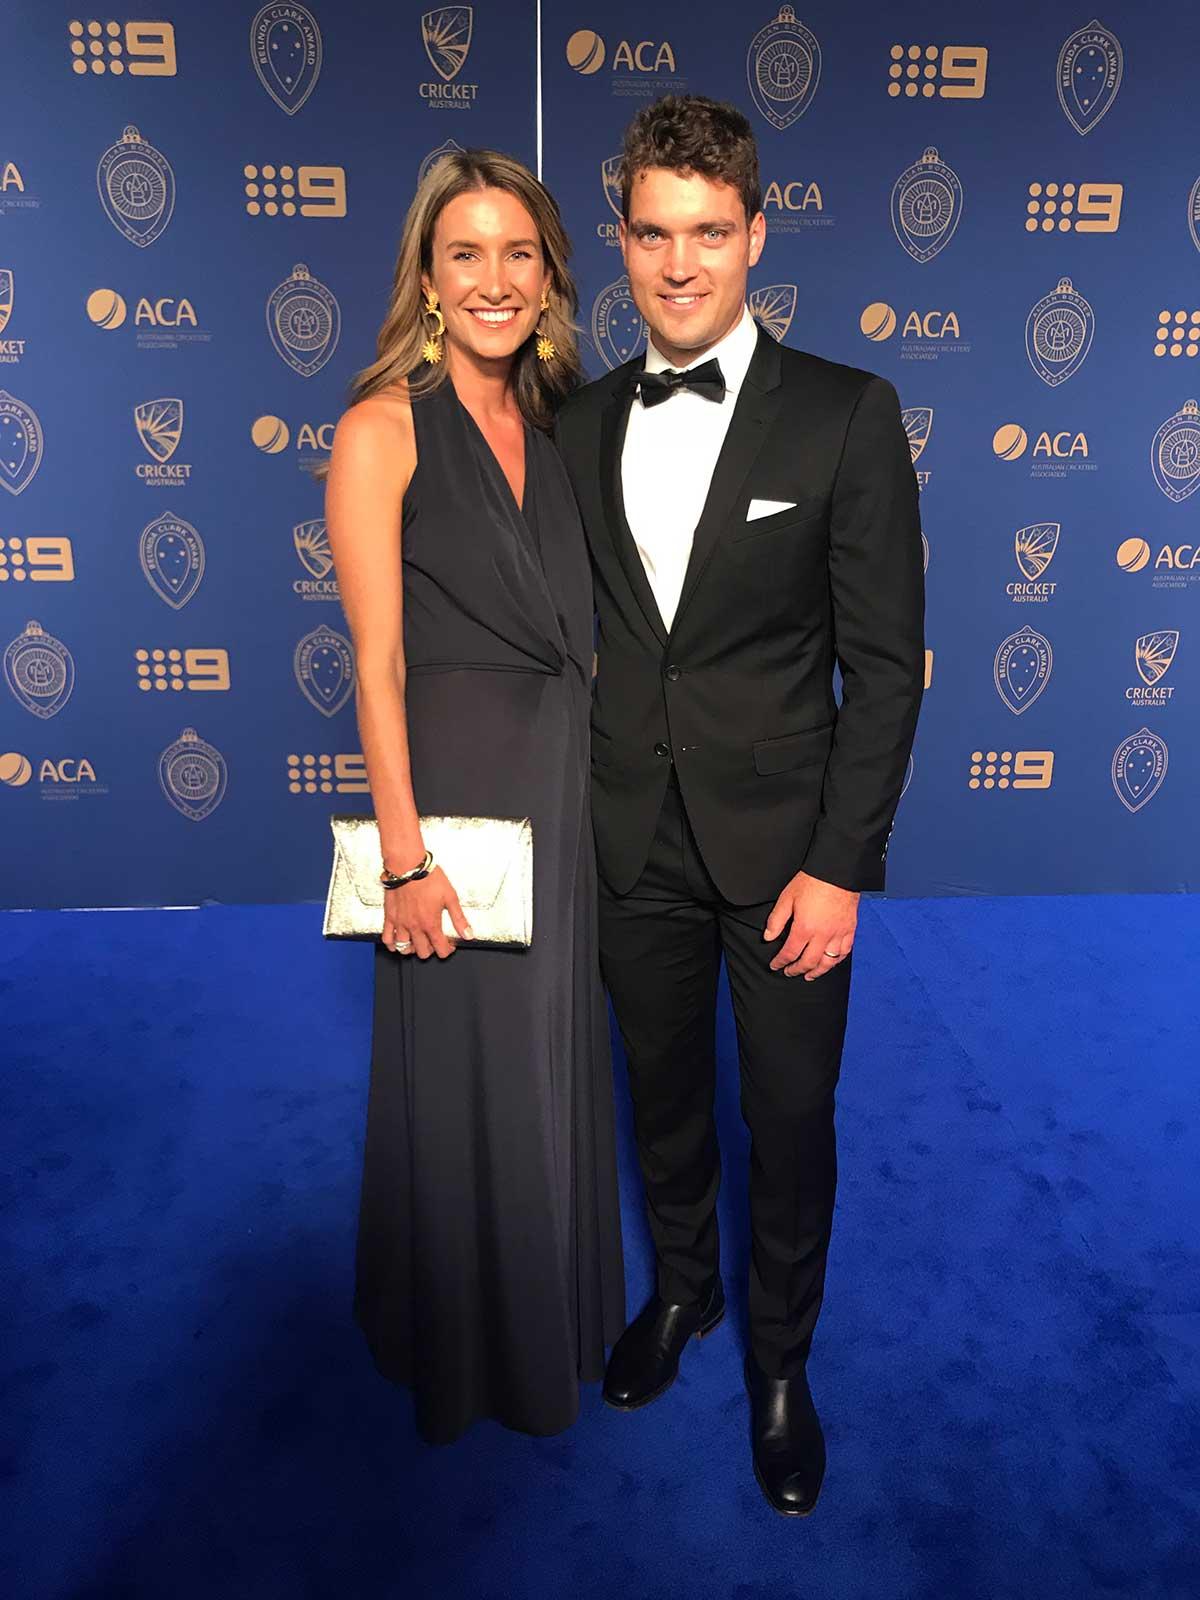 Wicketkeeper Alex Carey and wife Eloise // cricket.com.au